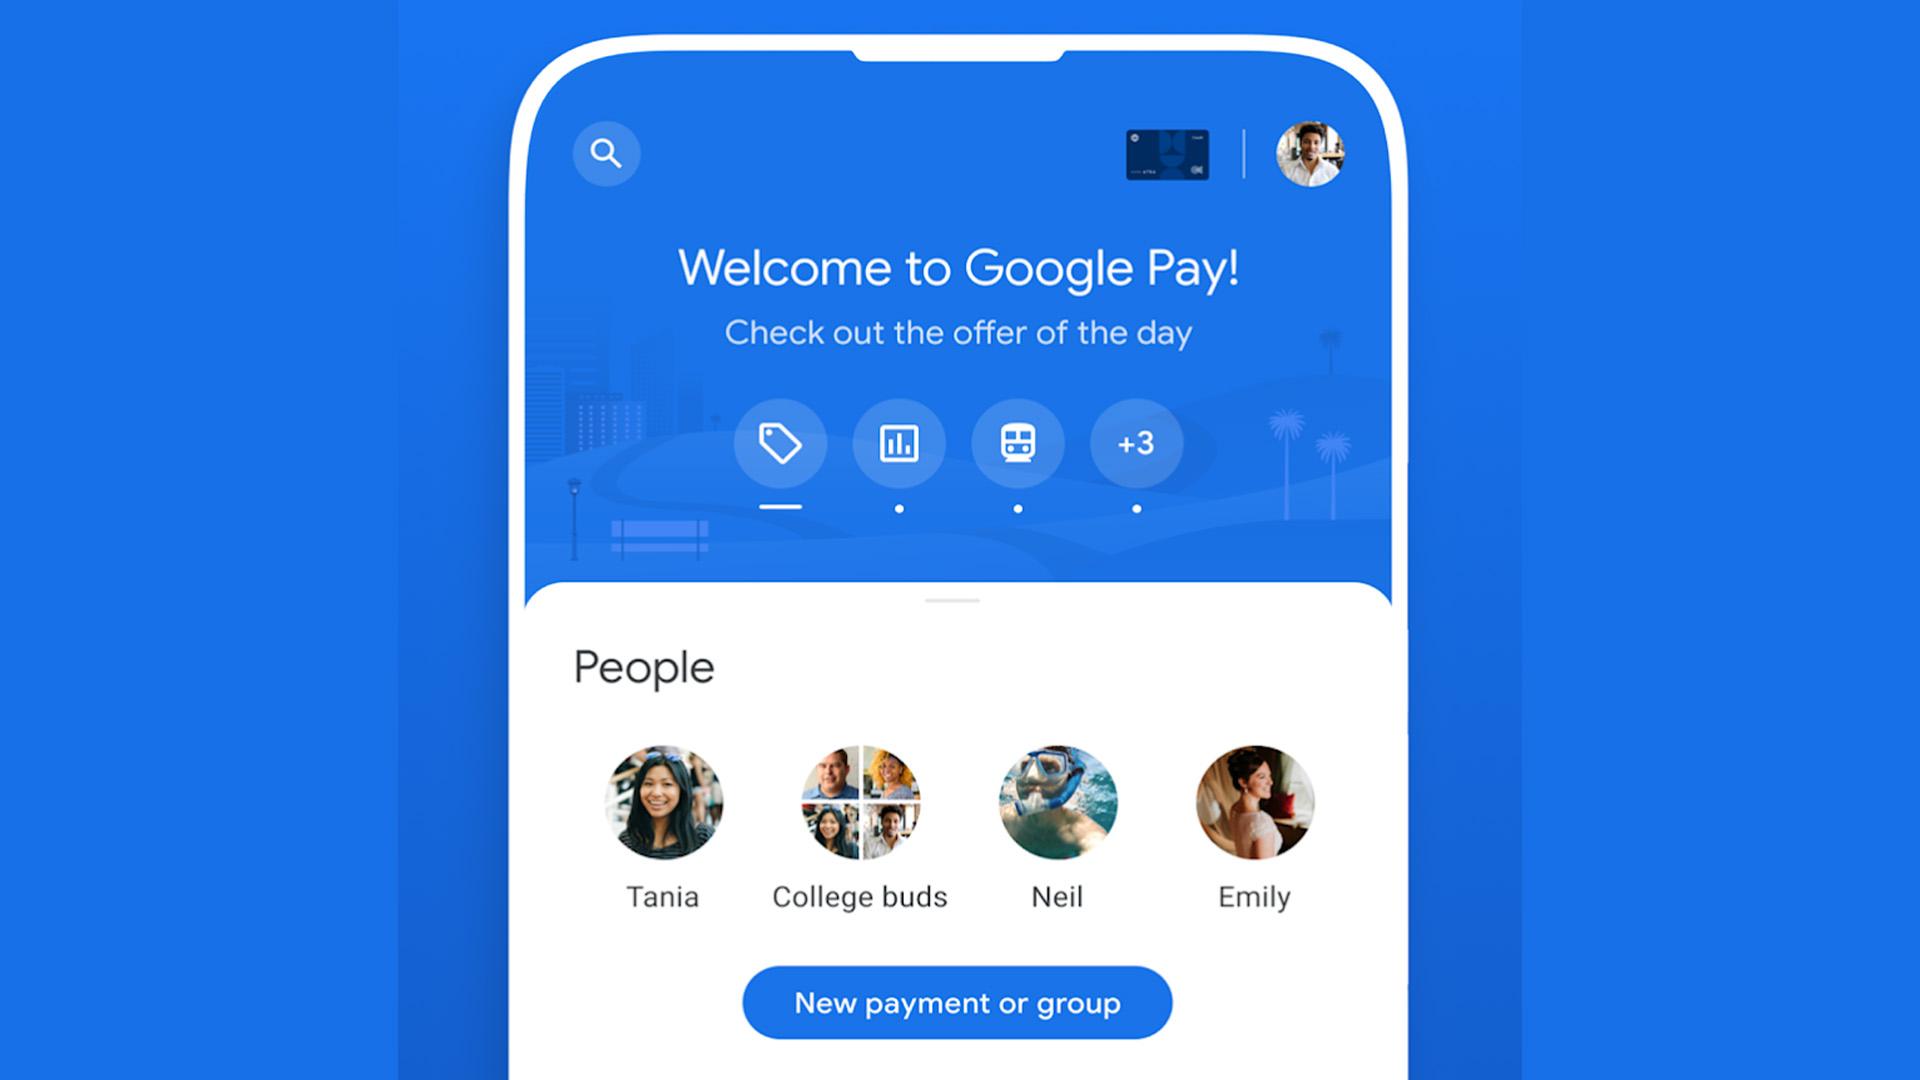 AAW Google Pay screenshot 2021